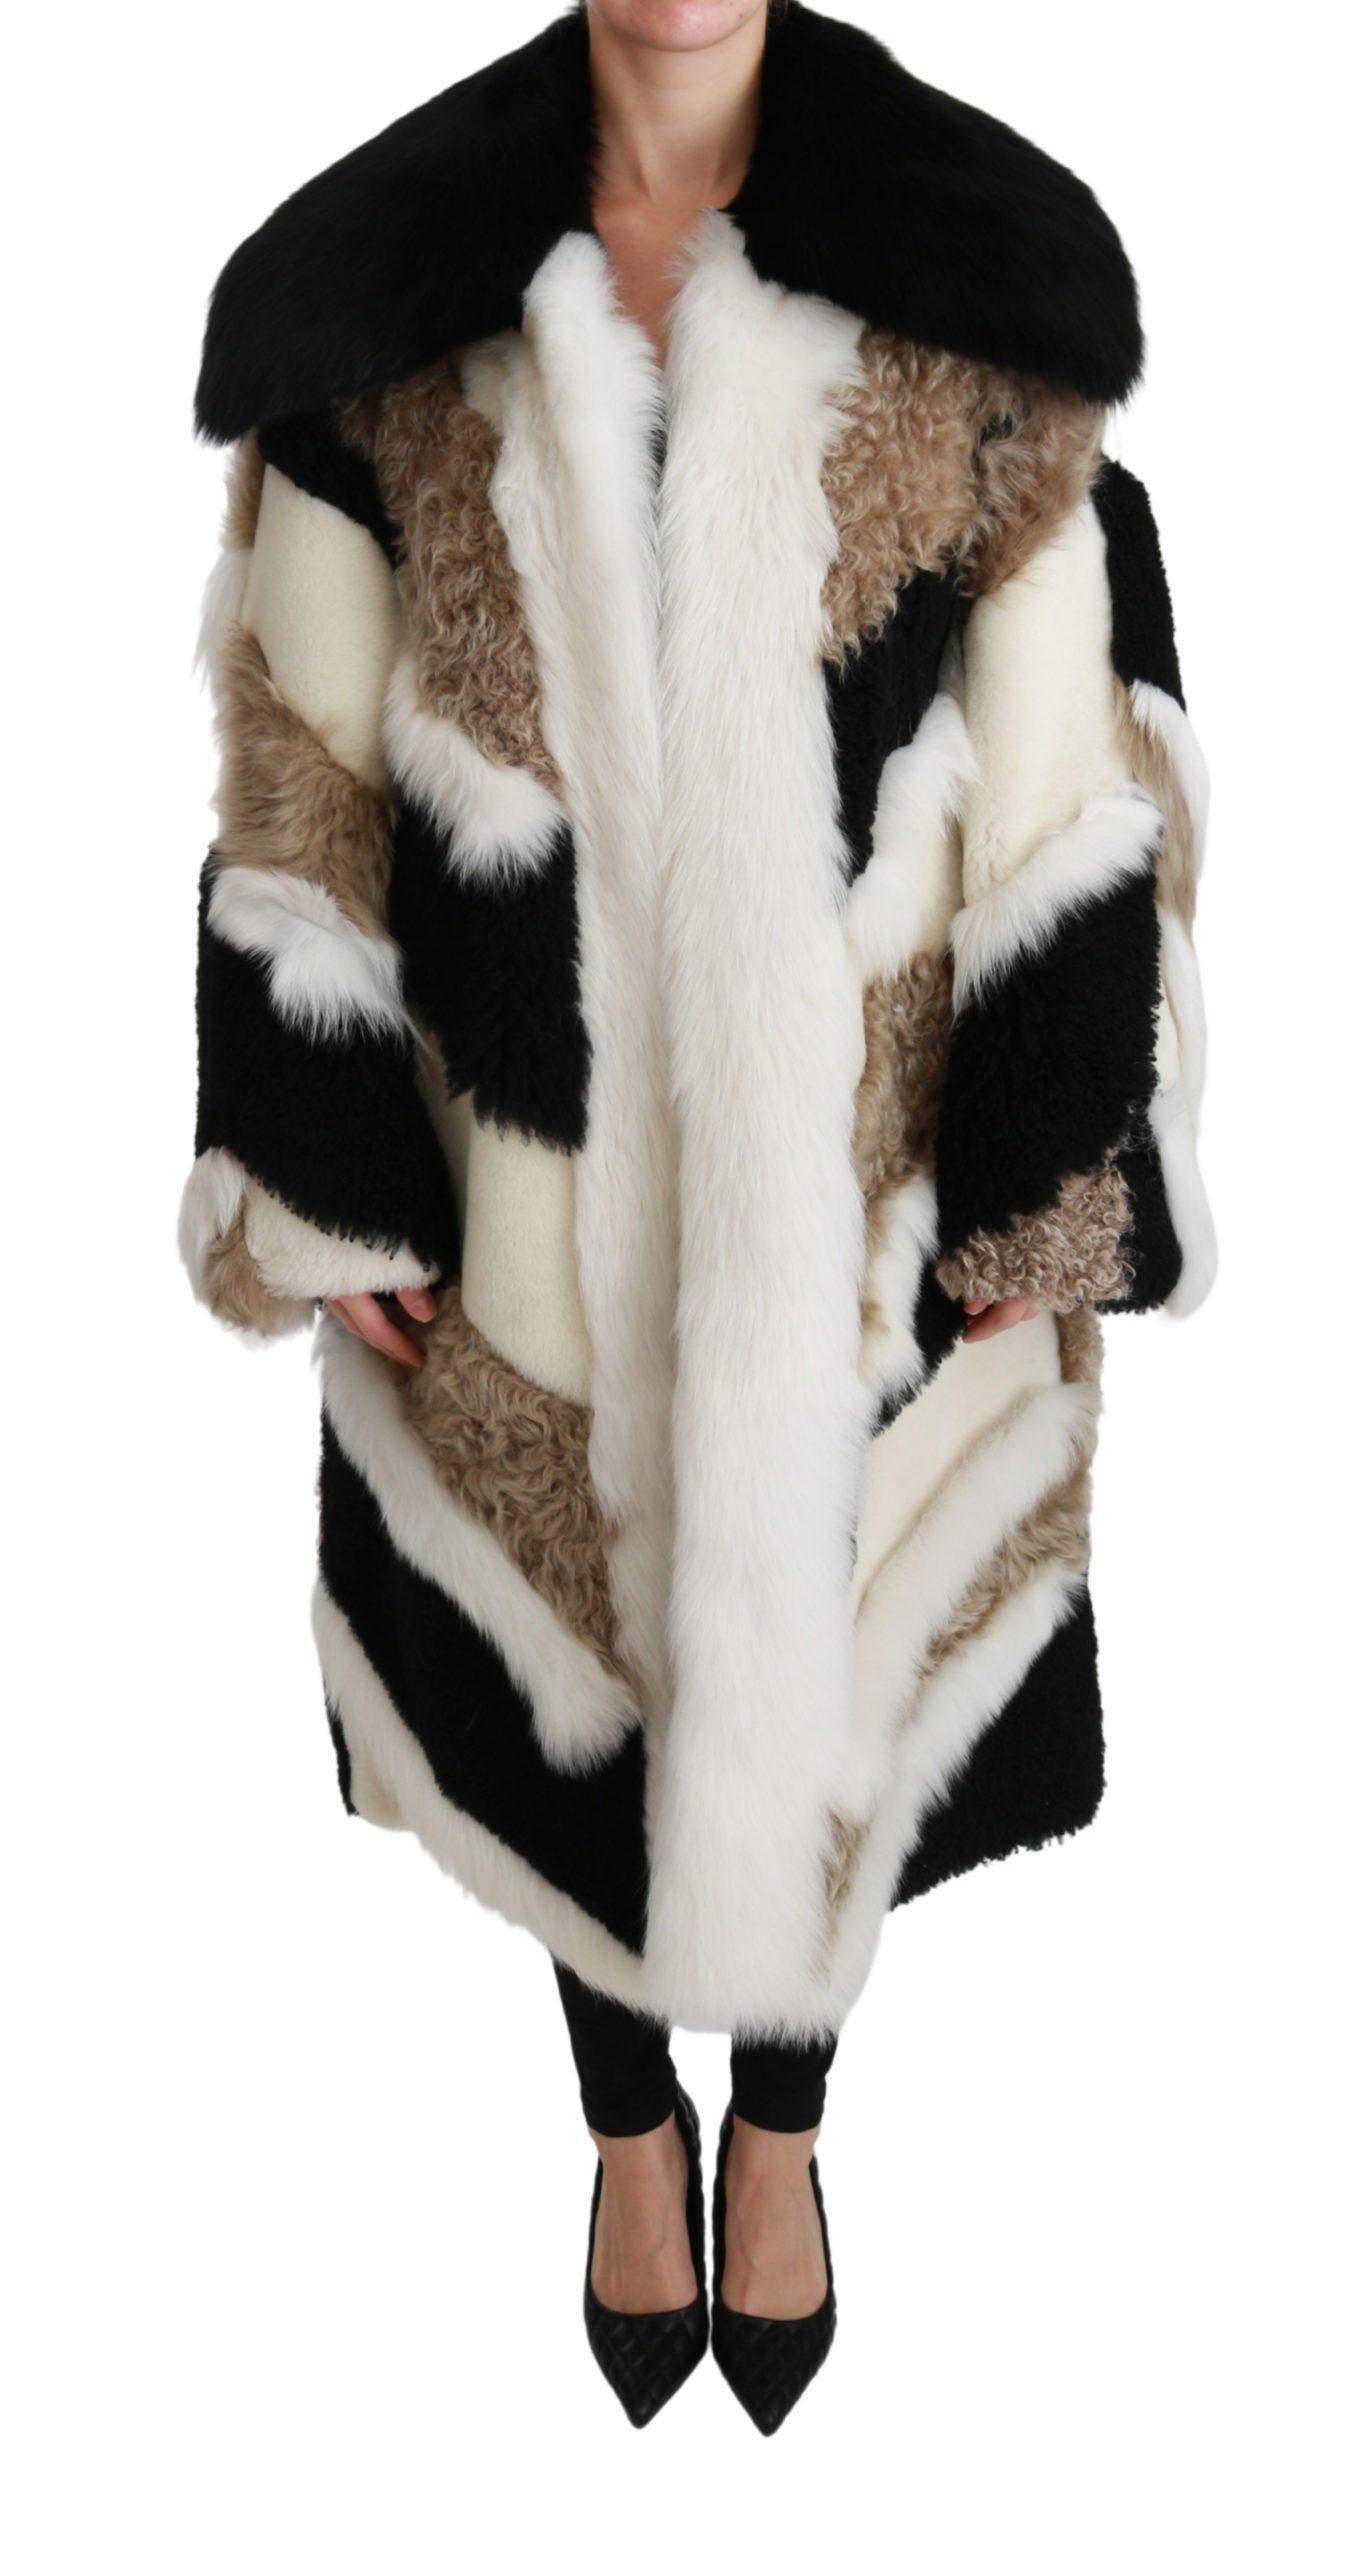 Dolce & Gabbana Women's Sheep Fur Shearling Cape Jacket Coat Multicolor JKT2569 - IT38 | S